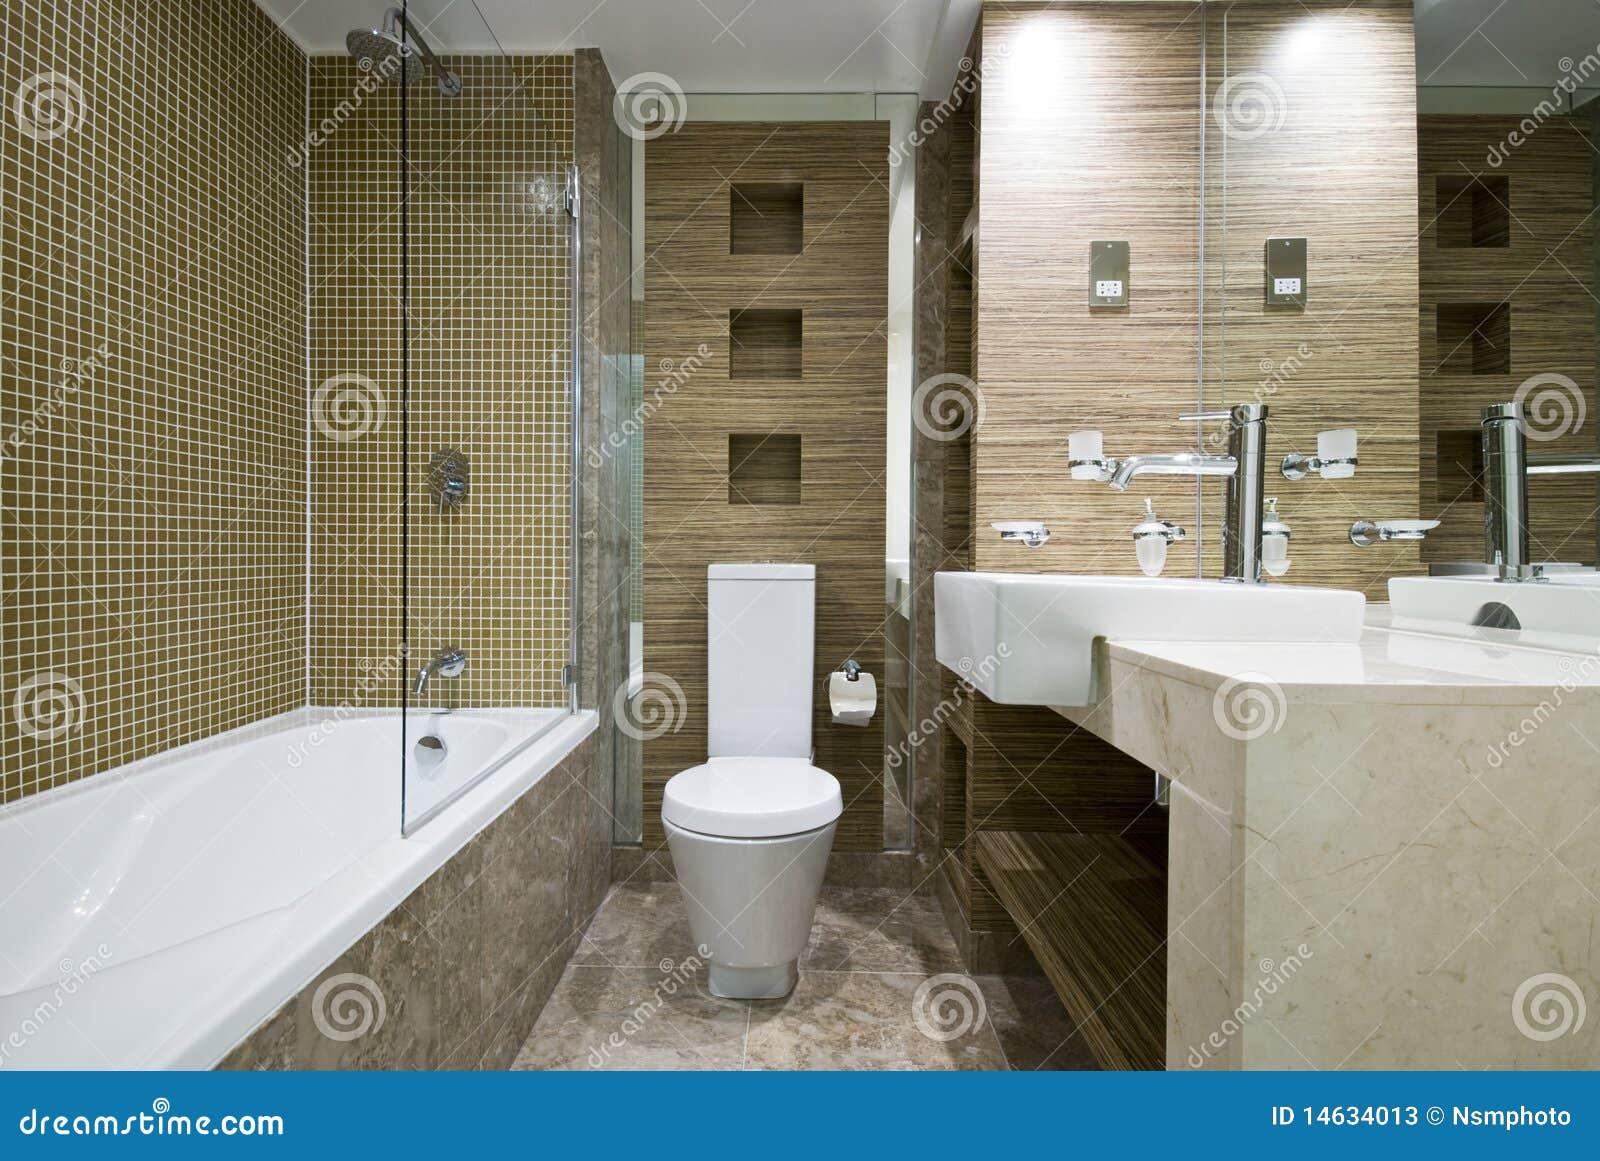 Baños Modernos De Marmol:Modern Mosaic Tile Bathroom Floor